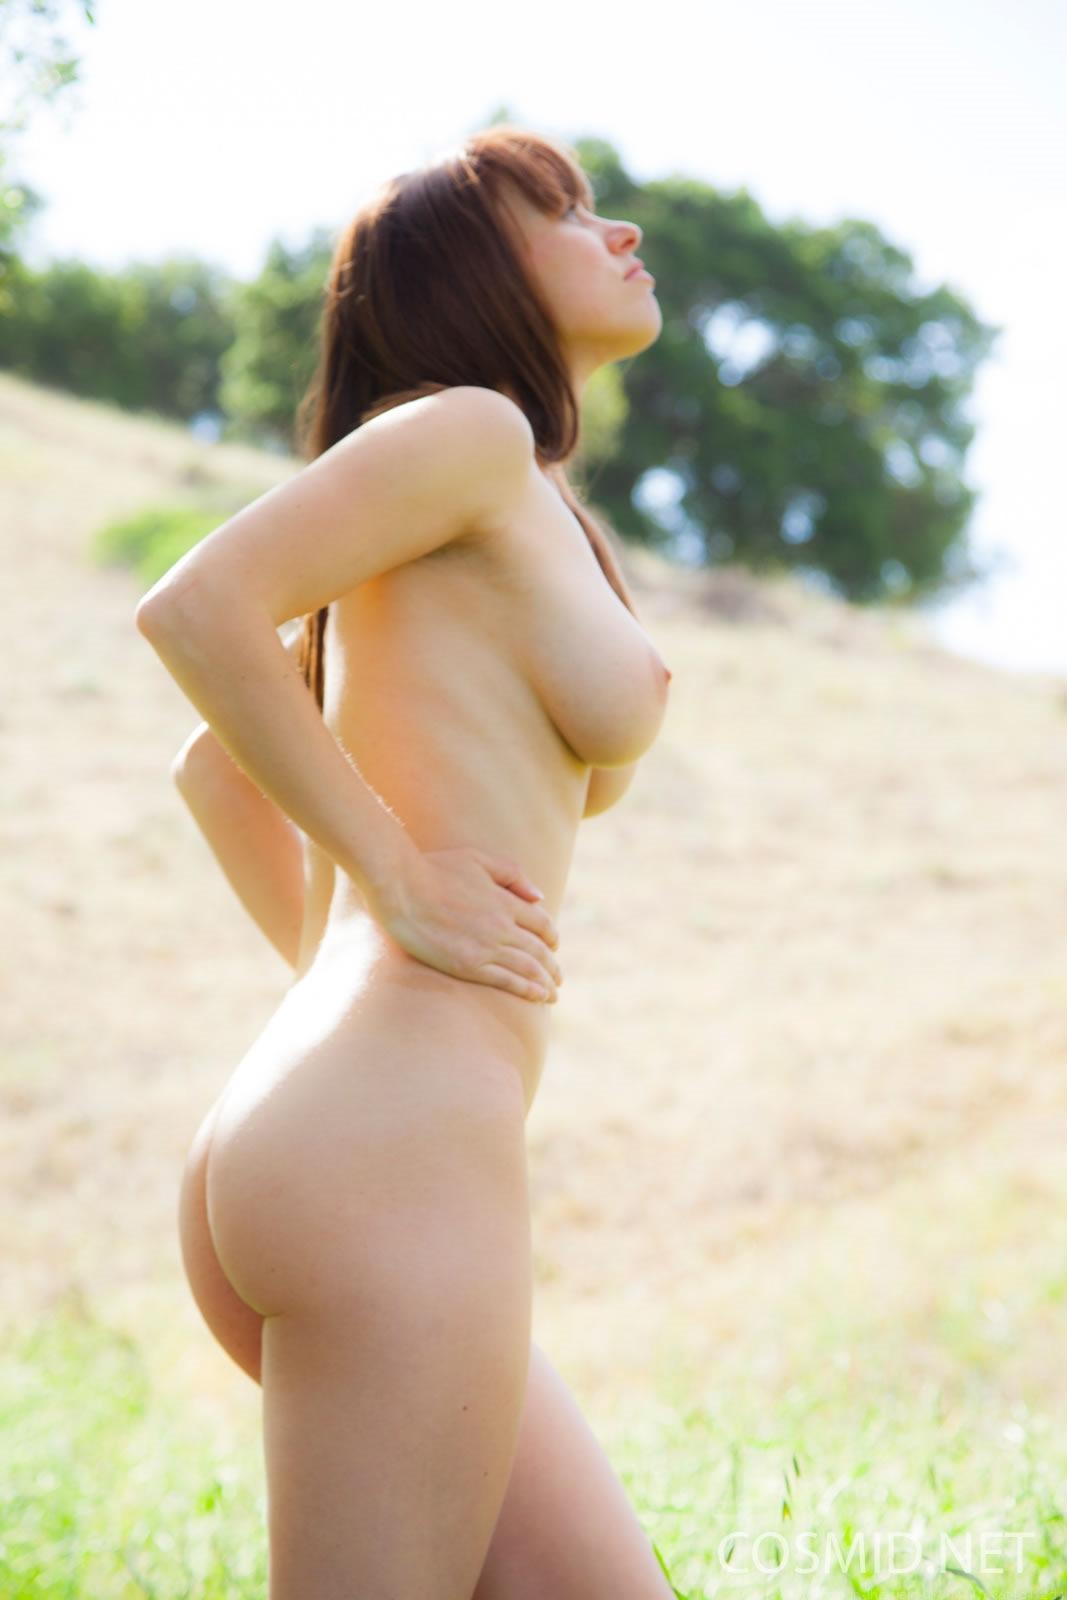 Were not Cosmid jessica davis nude